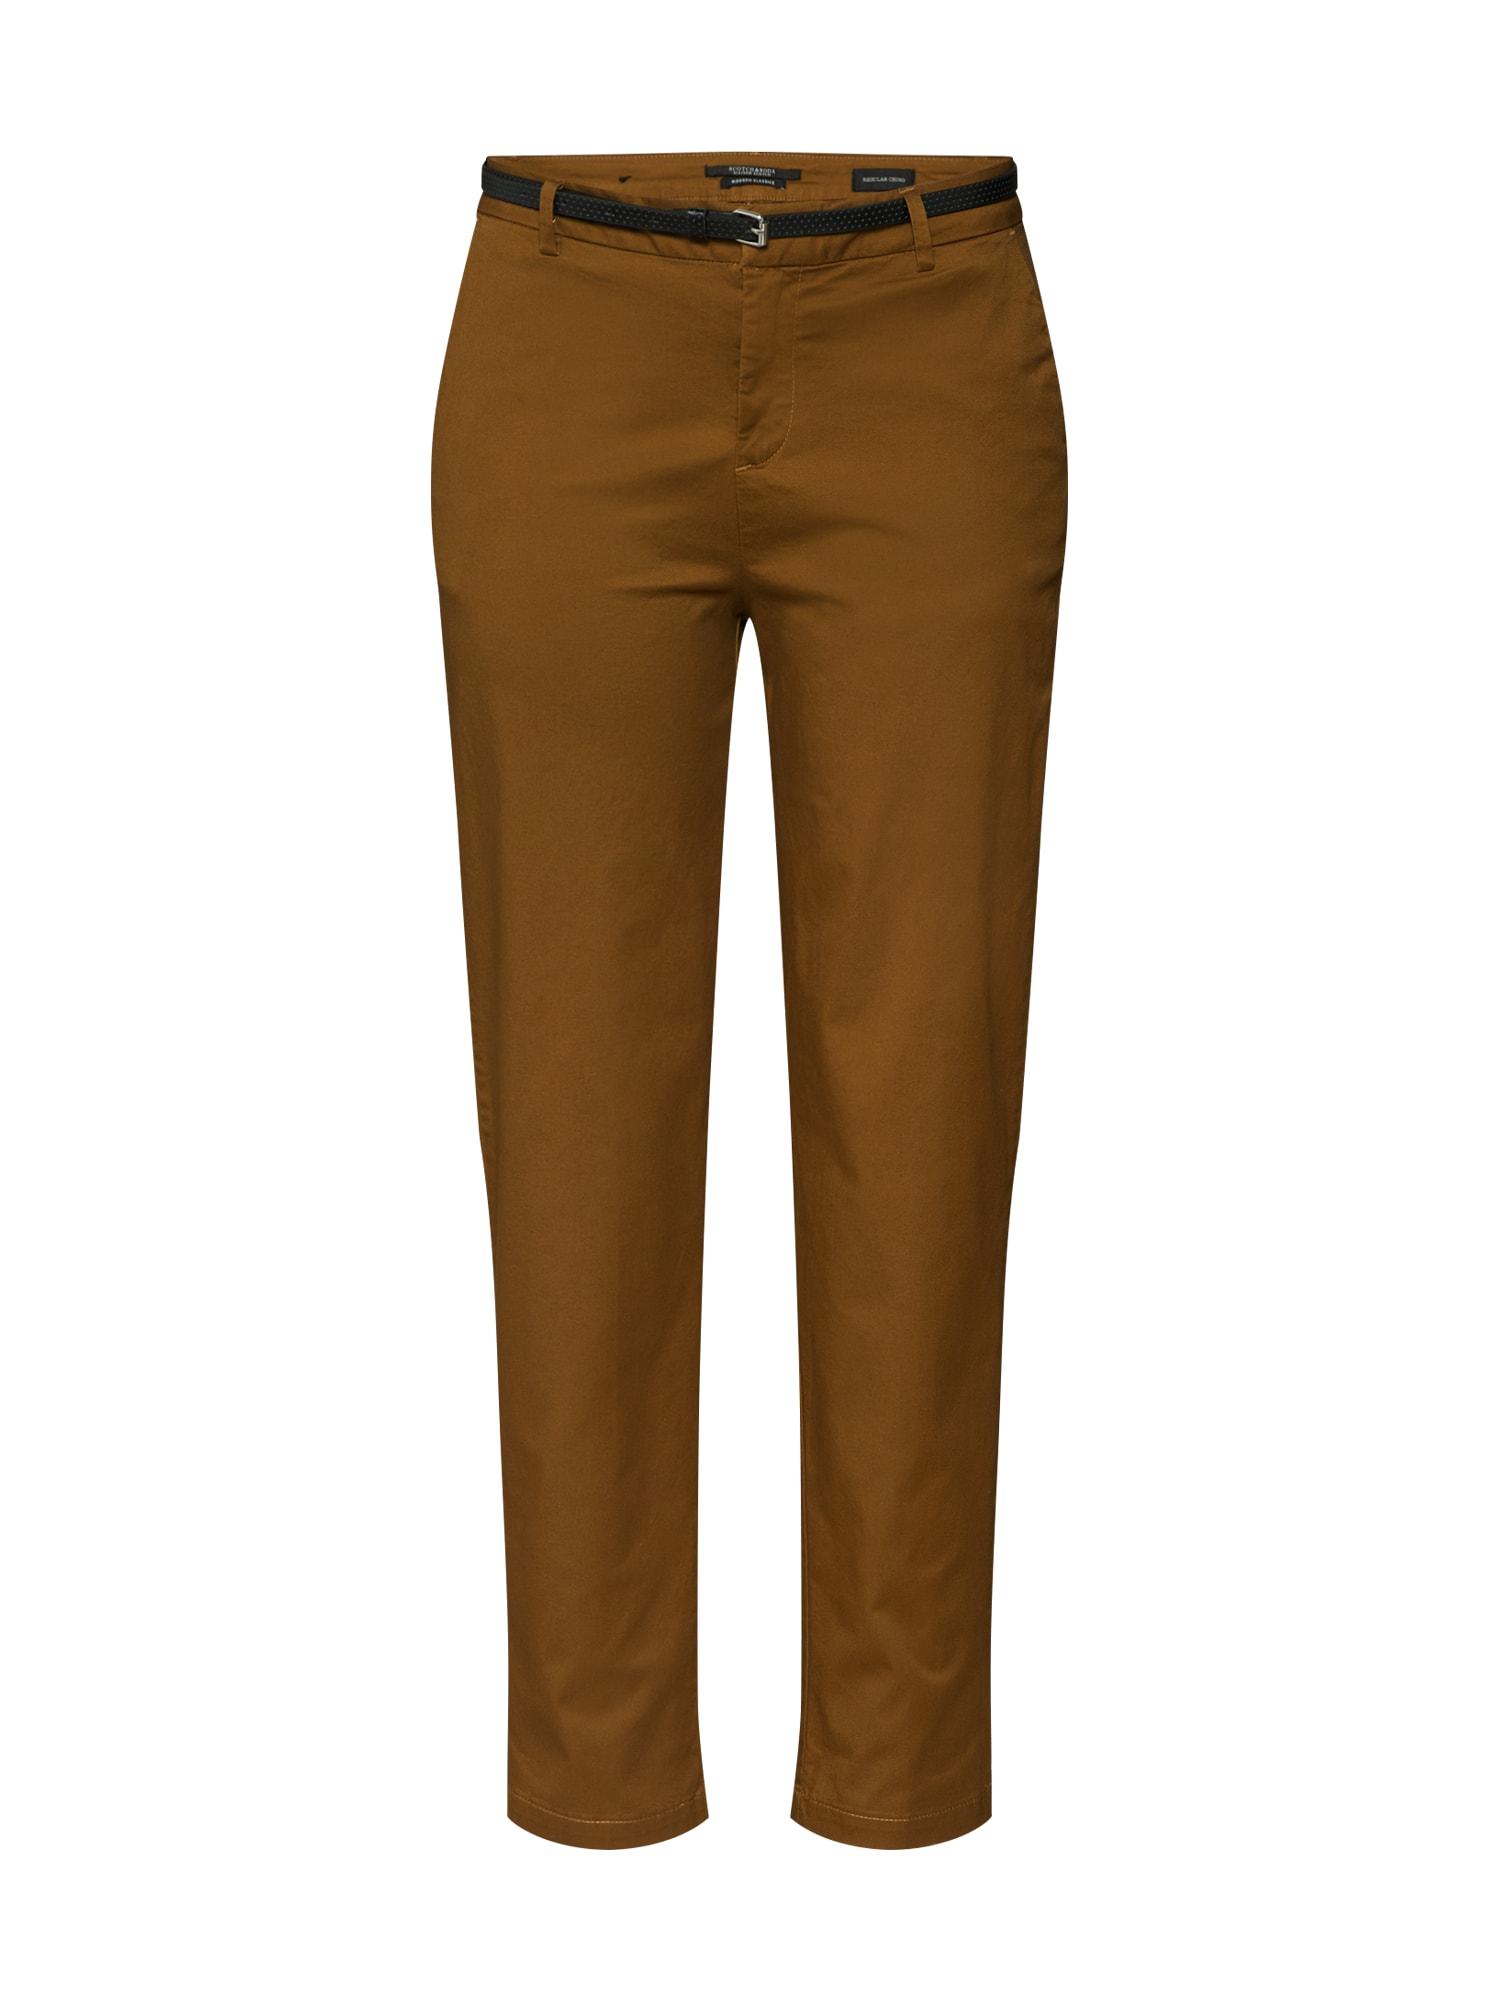 SCOTCH & SODA Chino kalhoty  hnědá